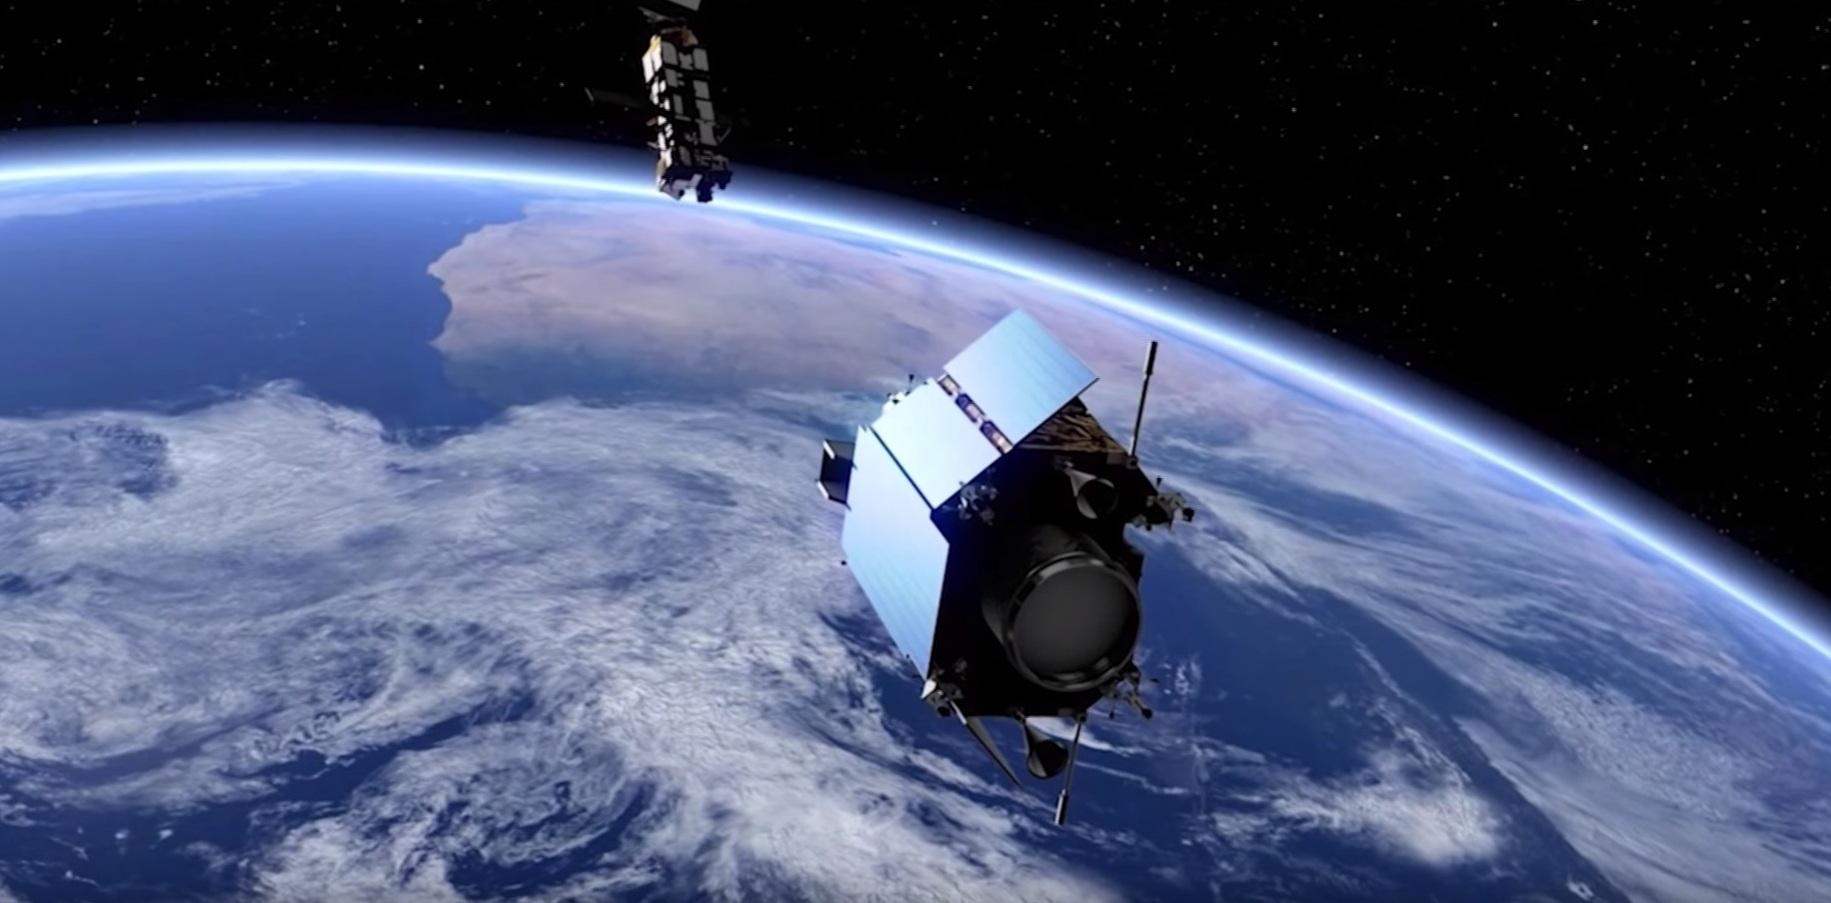 e.Deorbit closing on target satellite